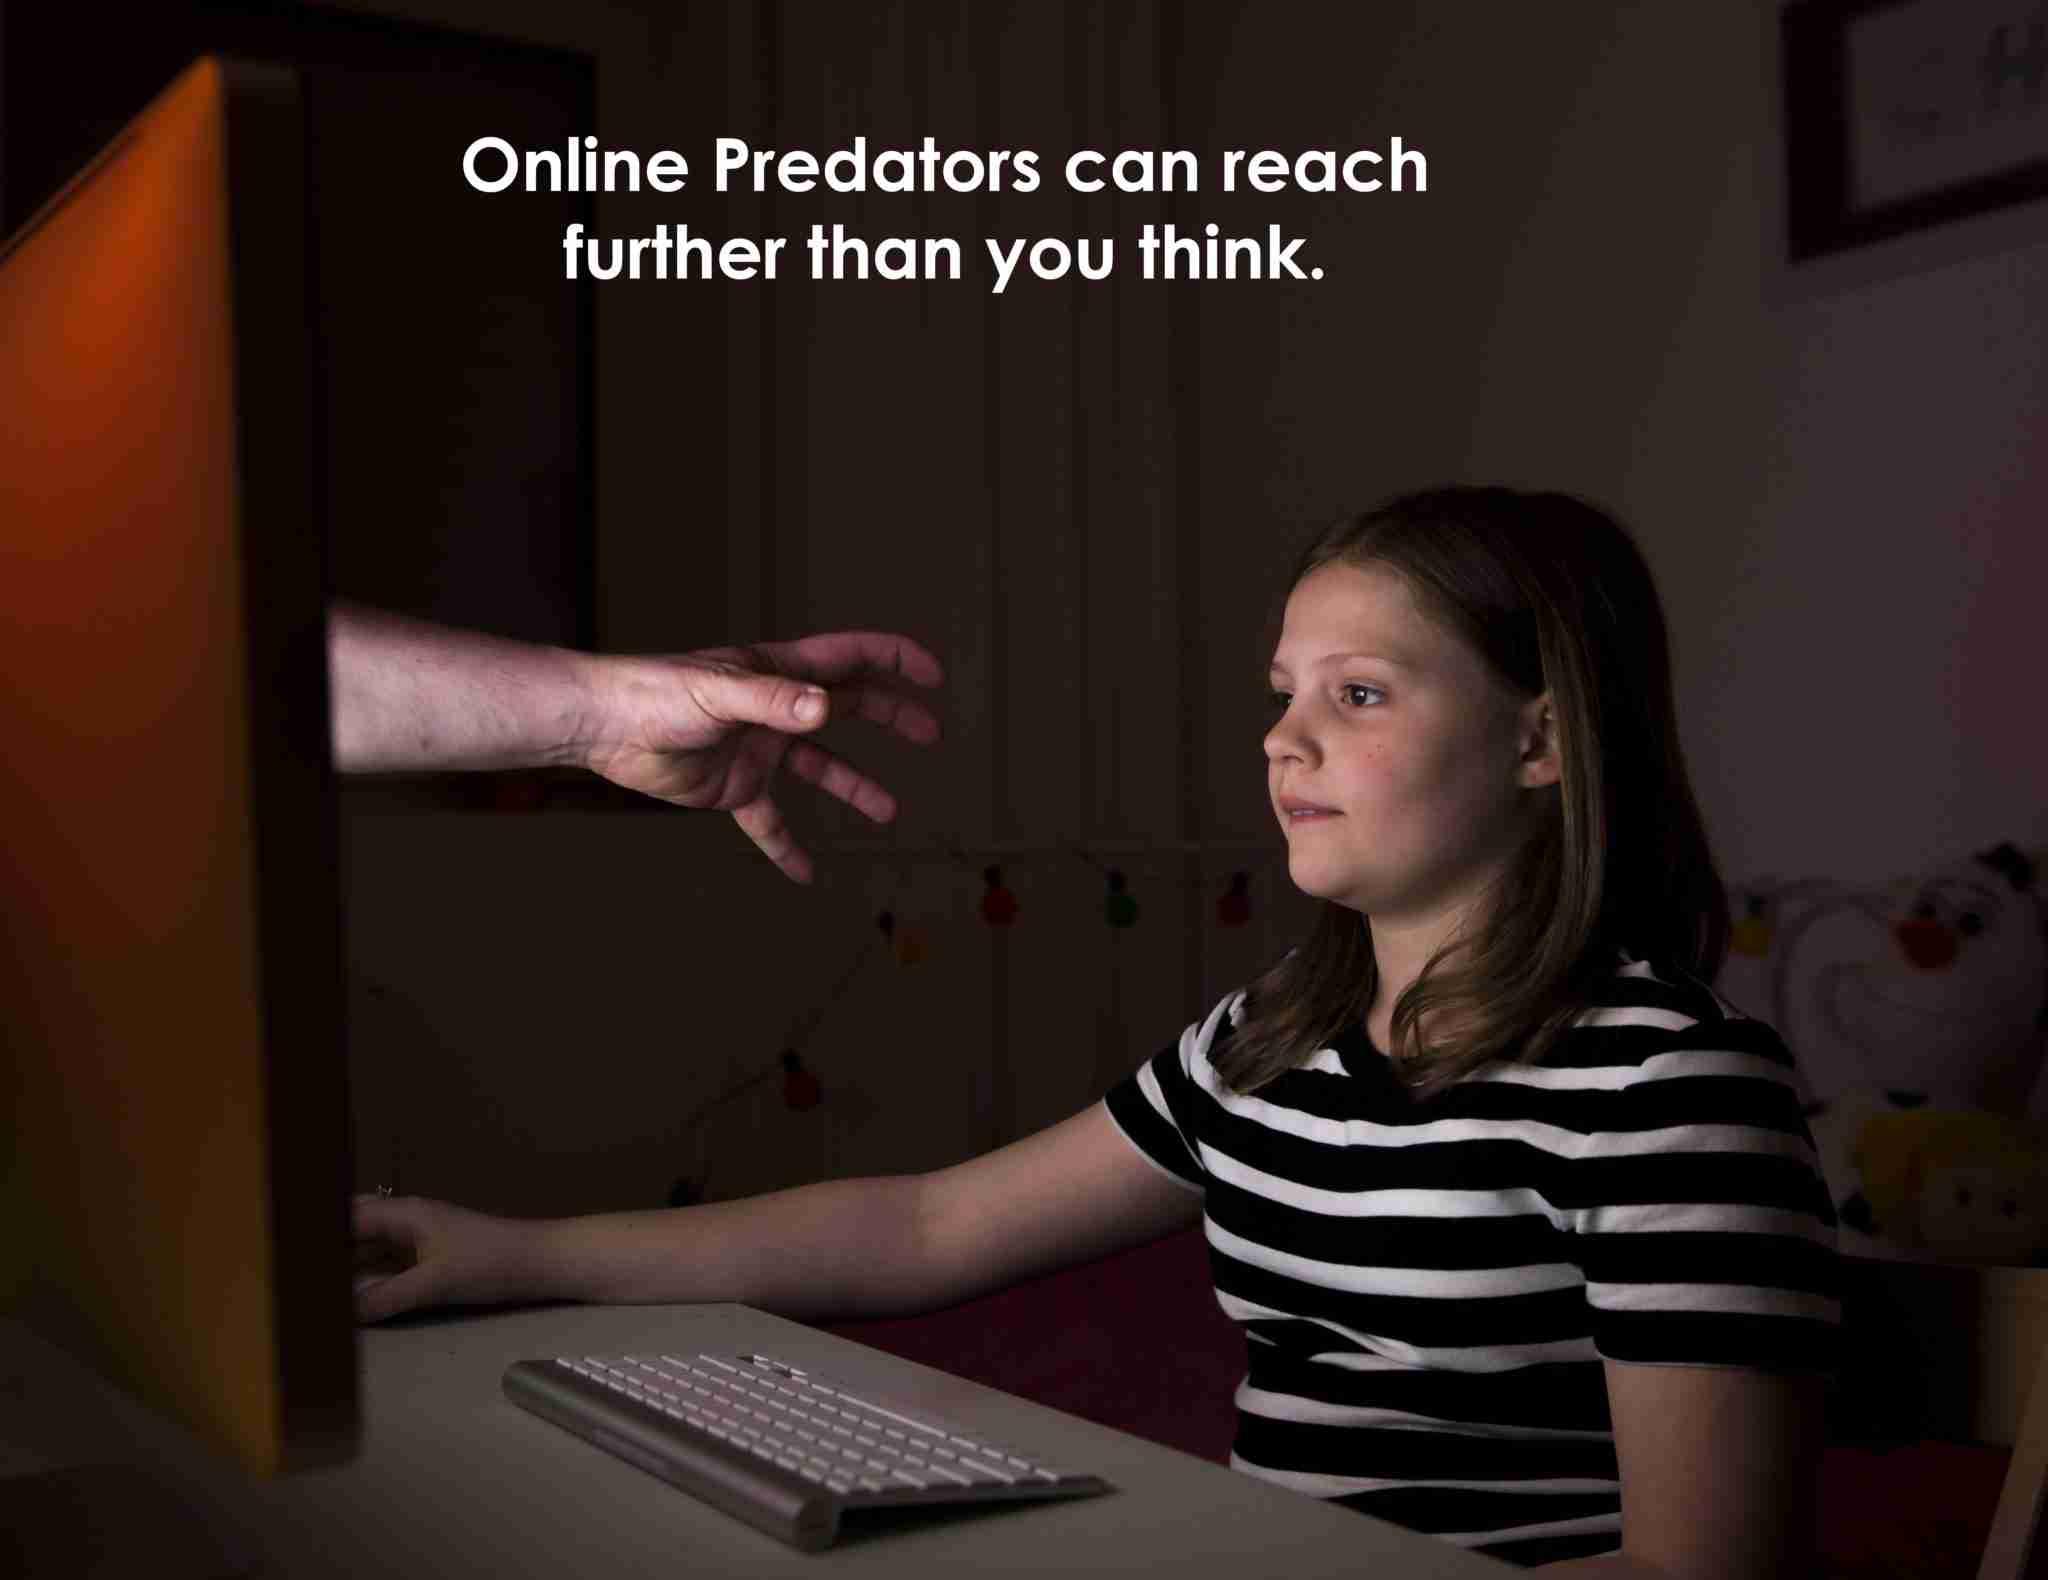 Predators among the masses